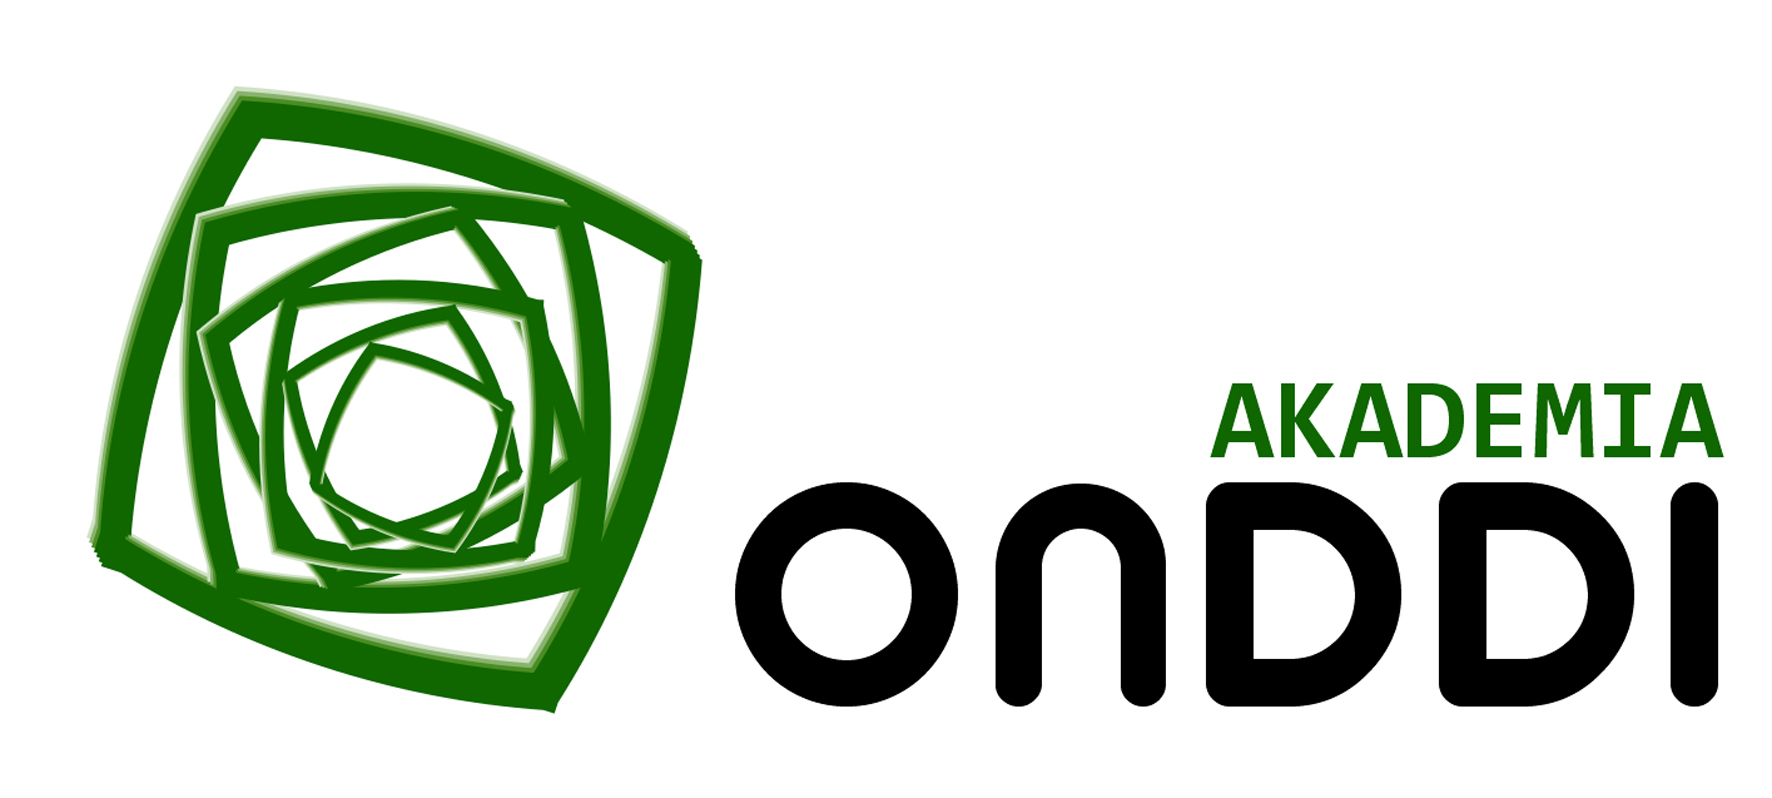 Onddi Akademia